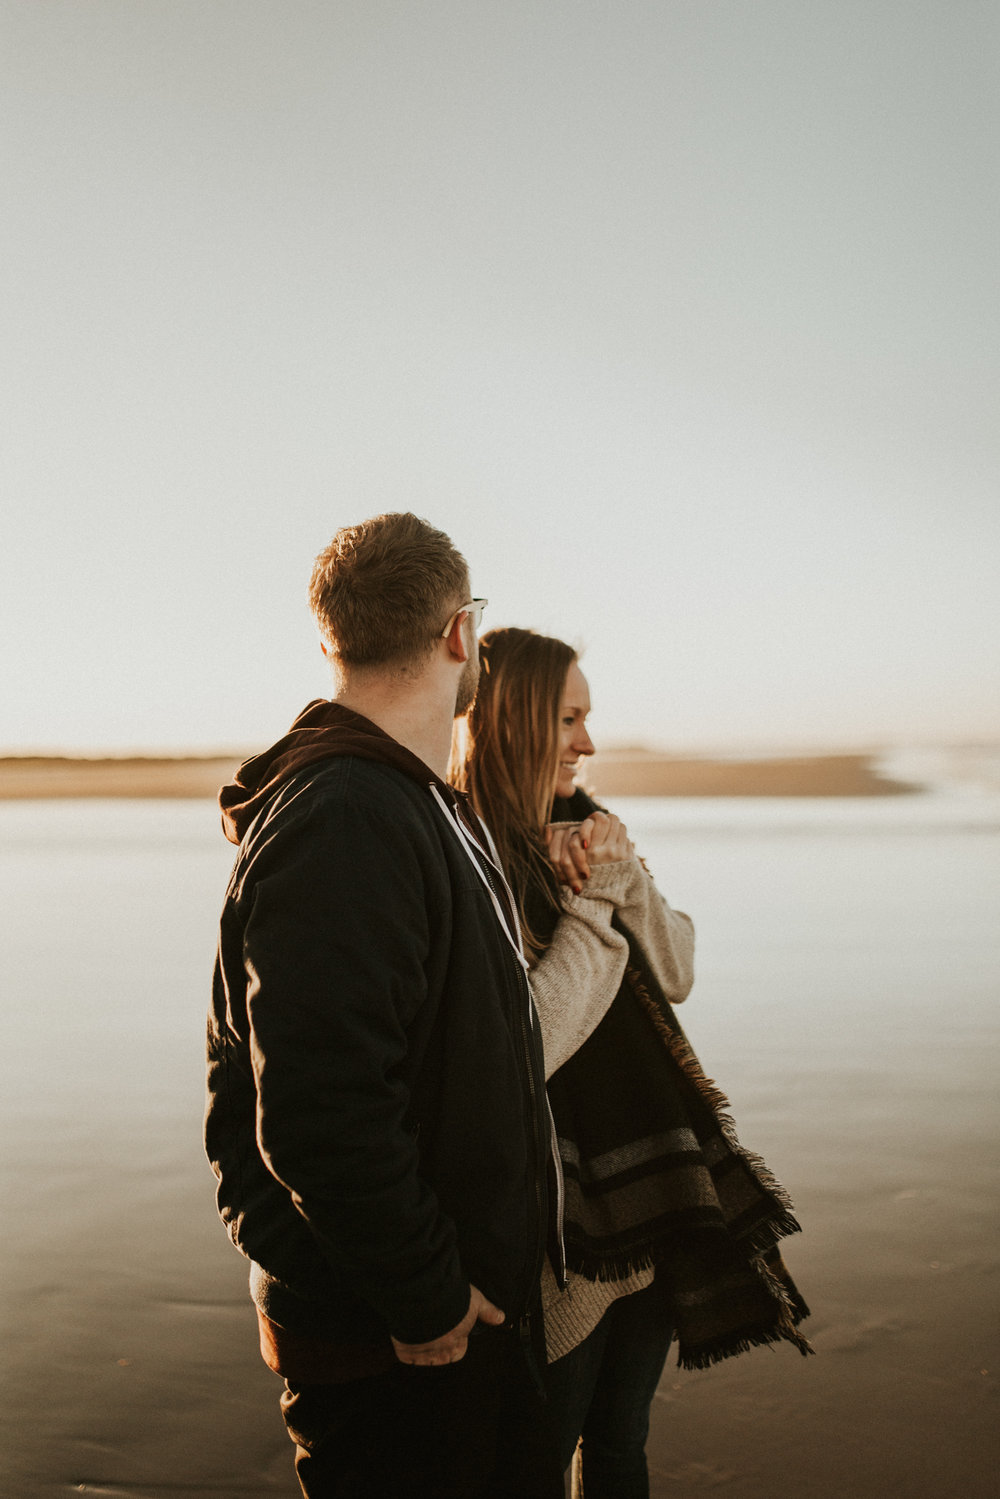 Luke-Mary-Engagement-Adventure-Session-Norfolk-Photography-Photographer-Darina-Stoda-41.jpg